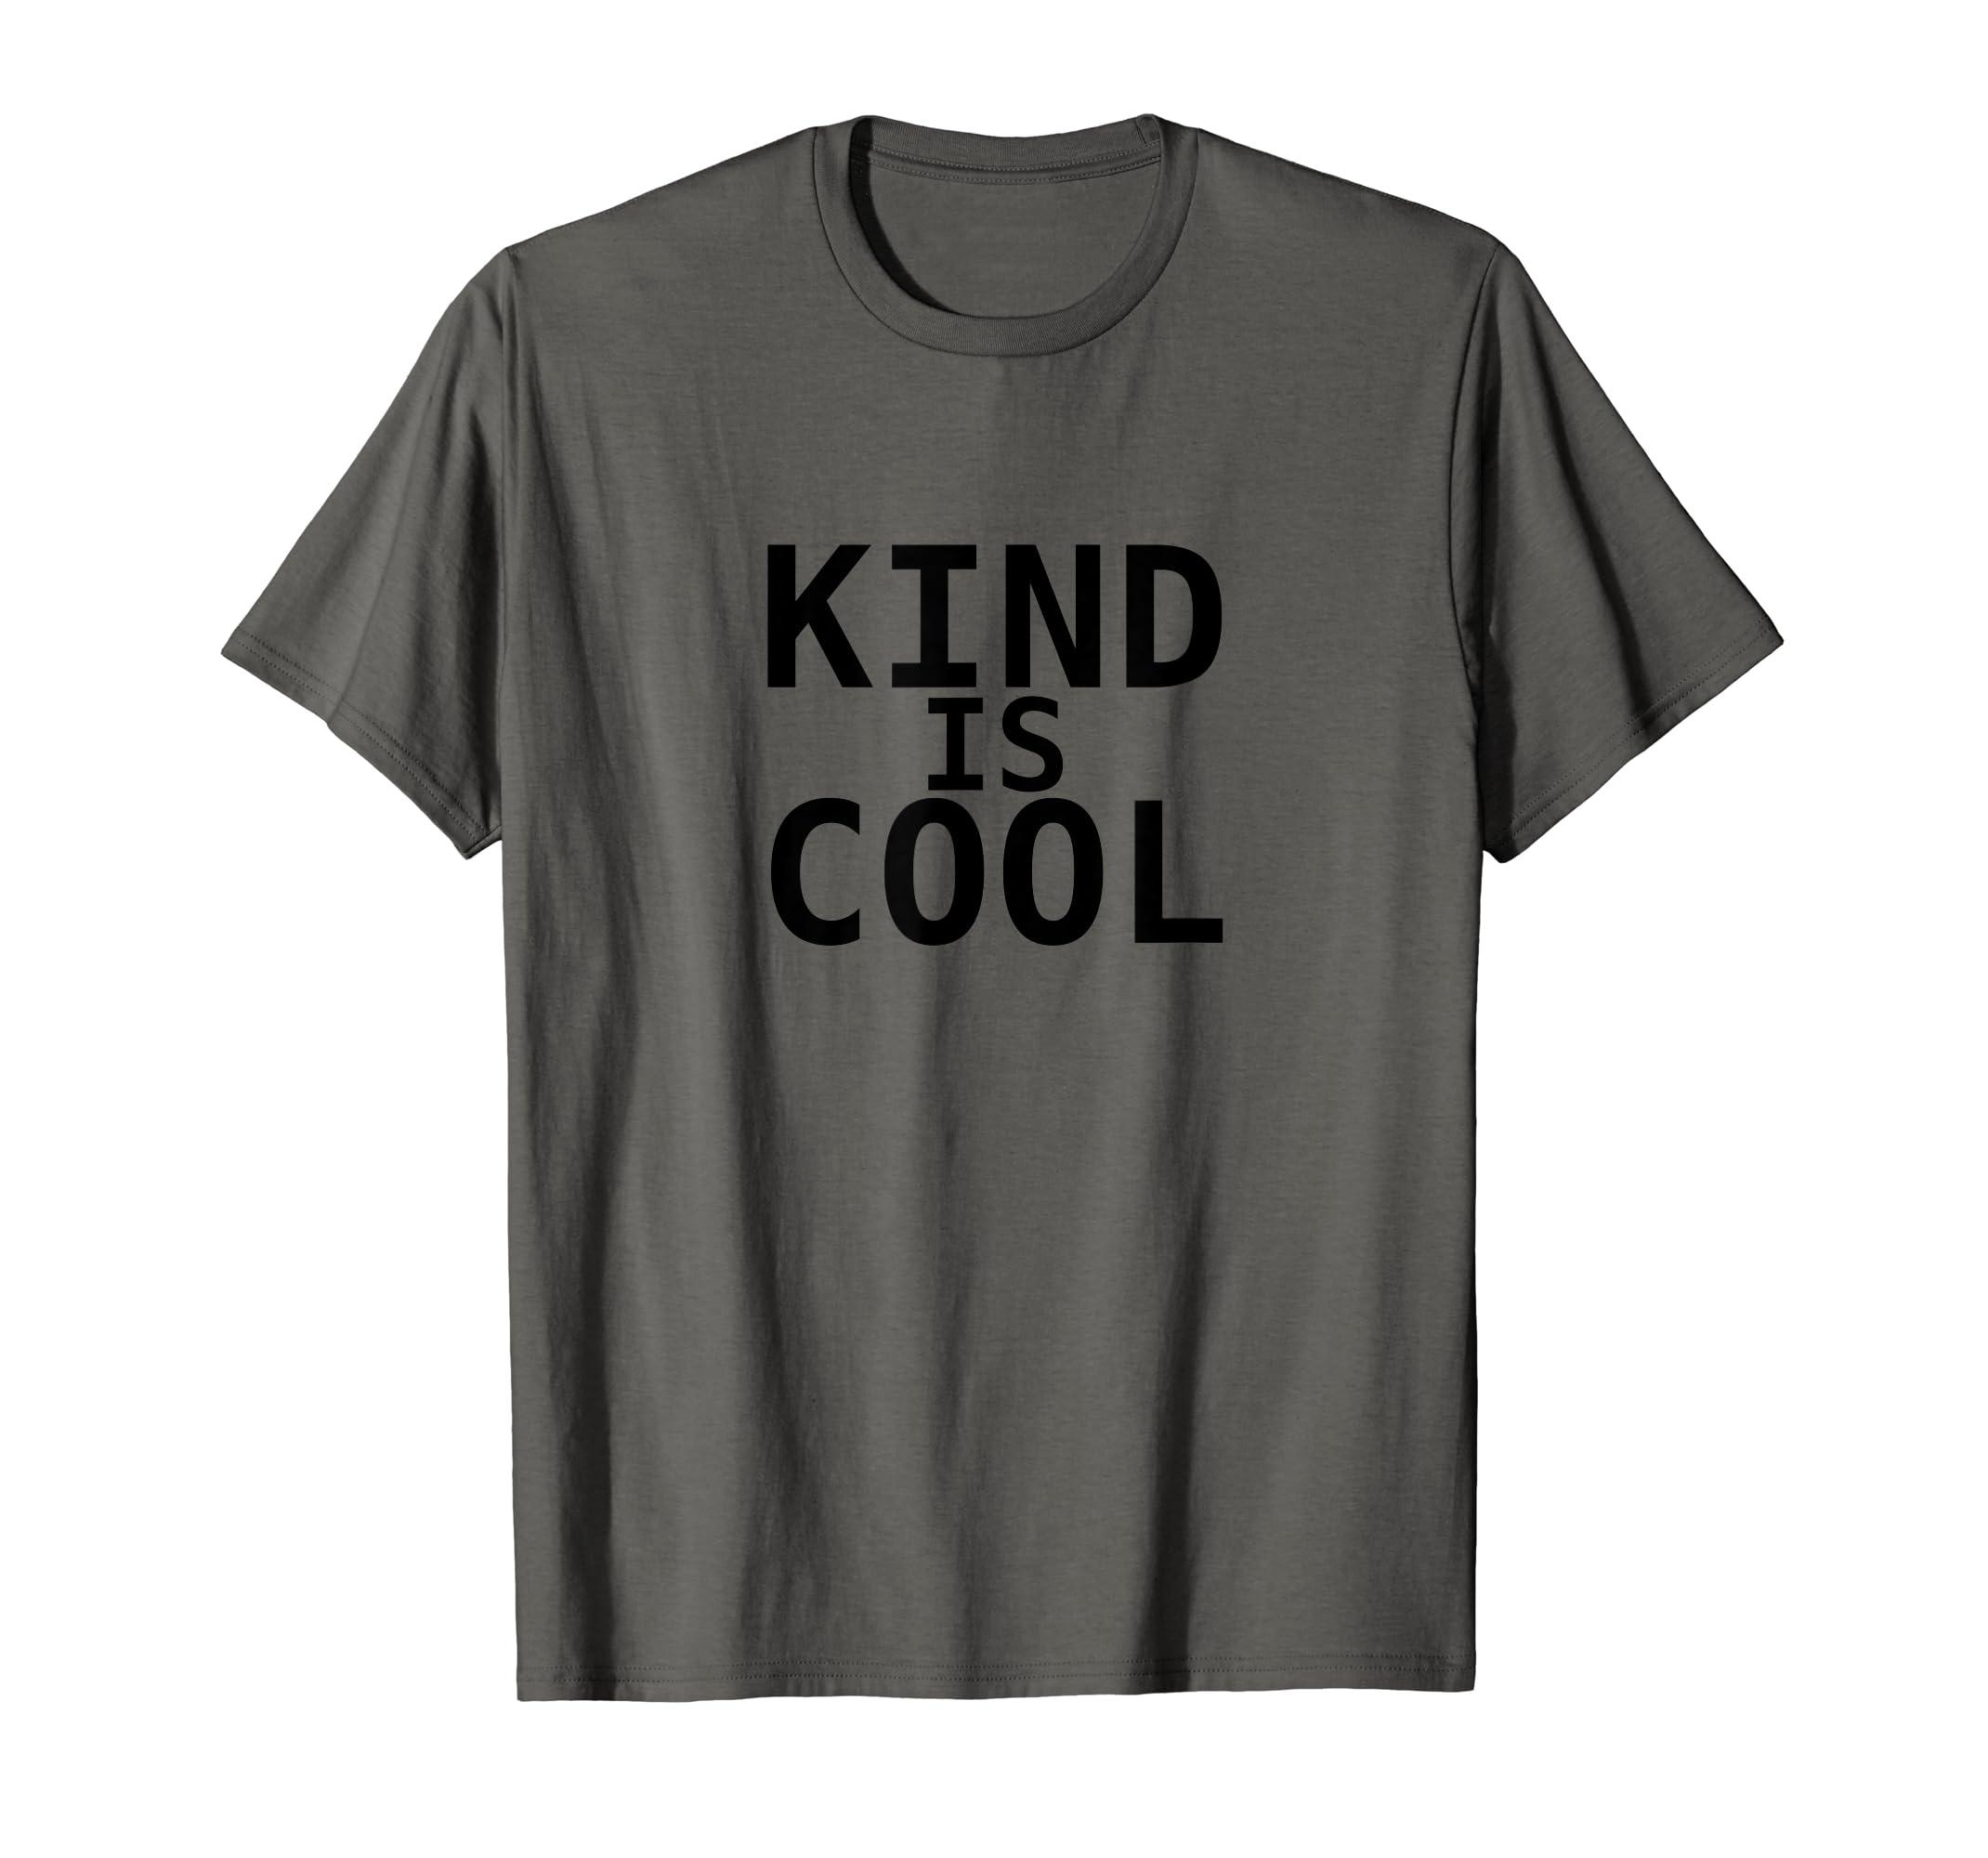 41e952714 Amazon.com: Kind is Cool Tee Shirt: Clothing